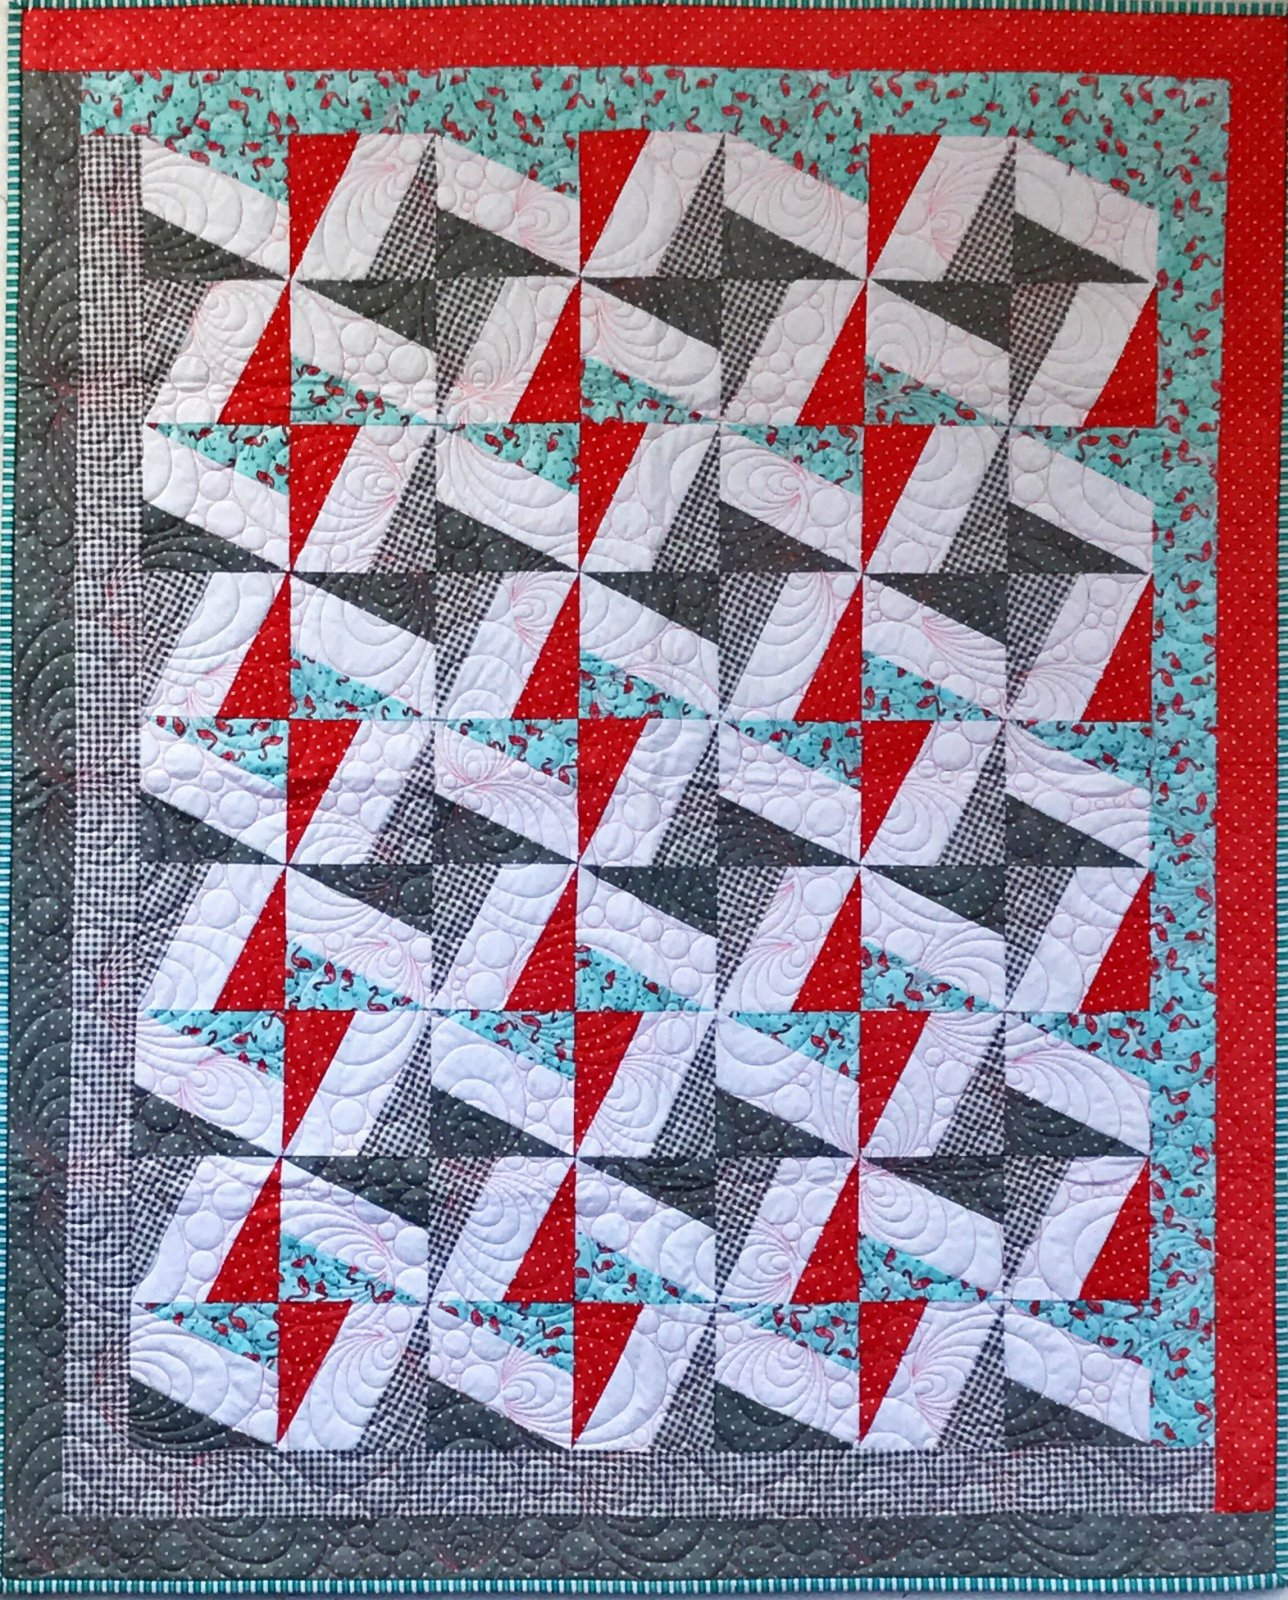 Morning Star Flamingo Quilt Kit